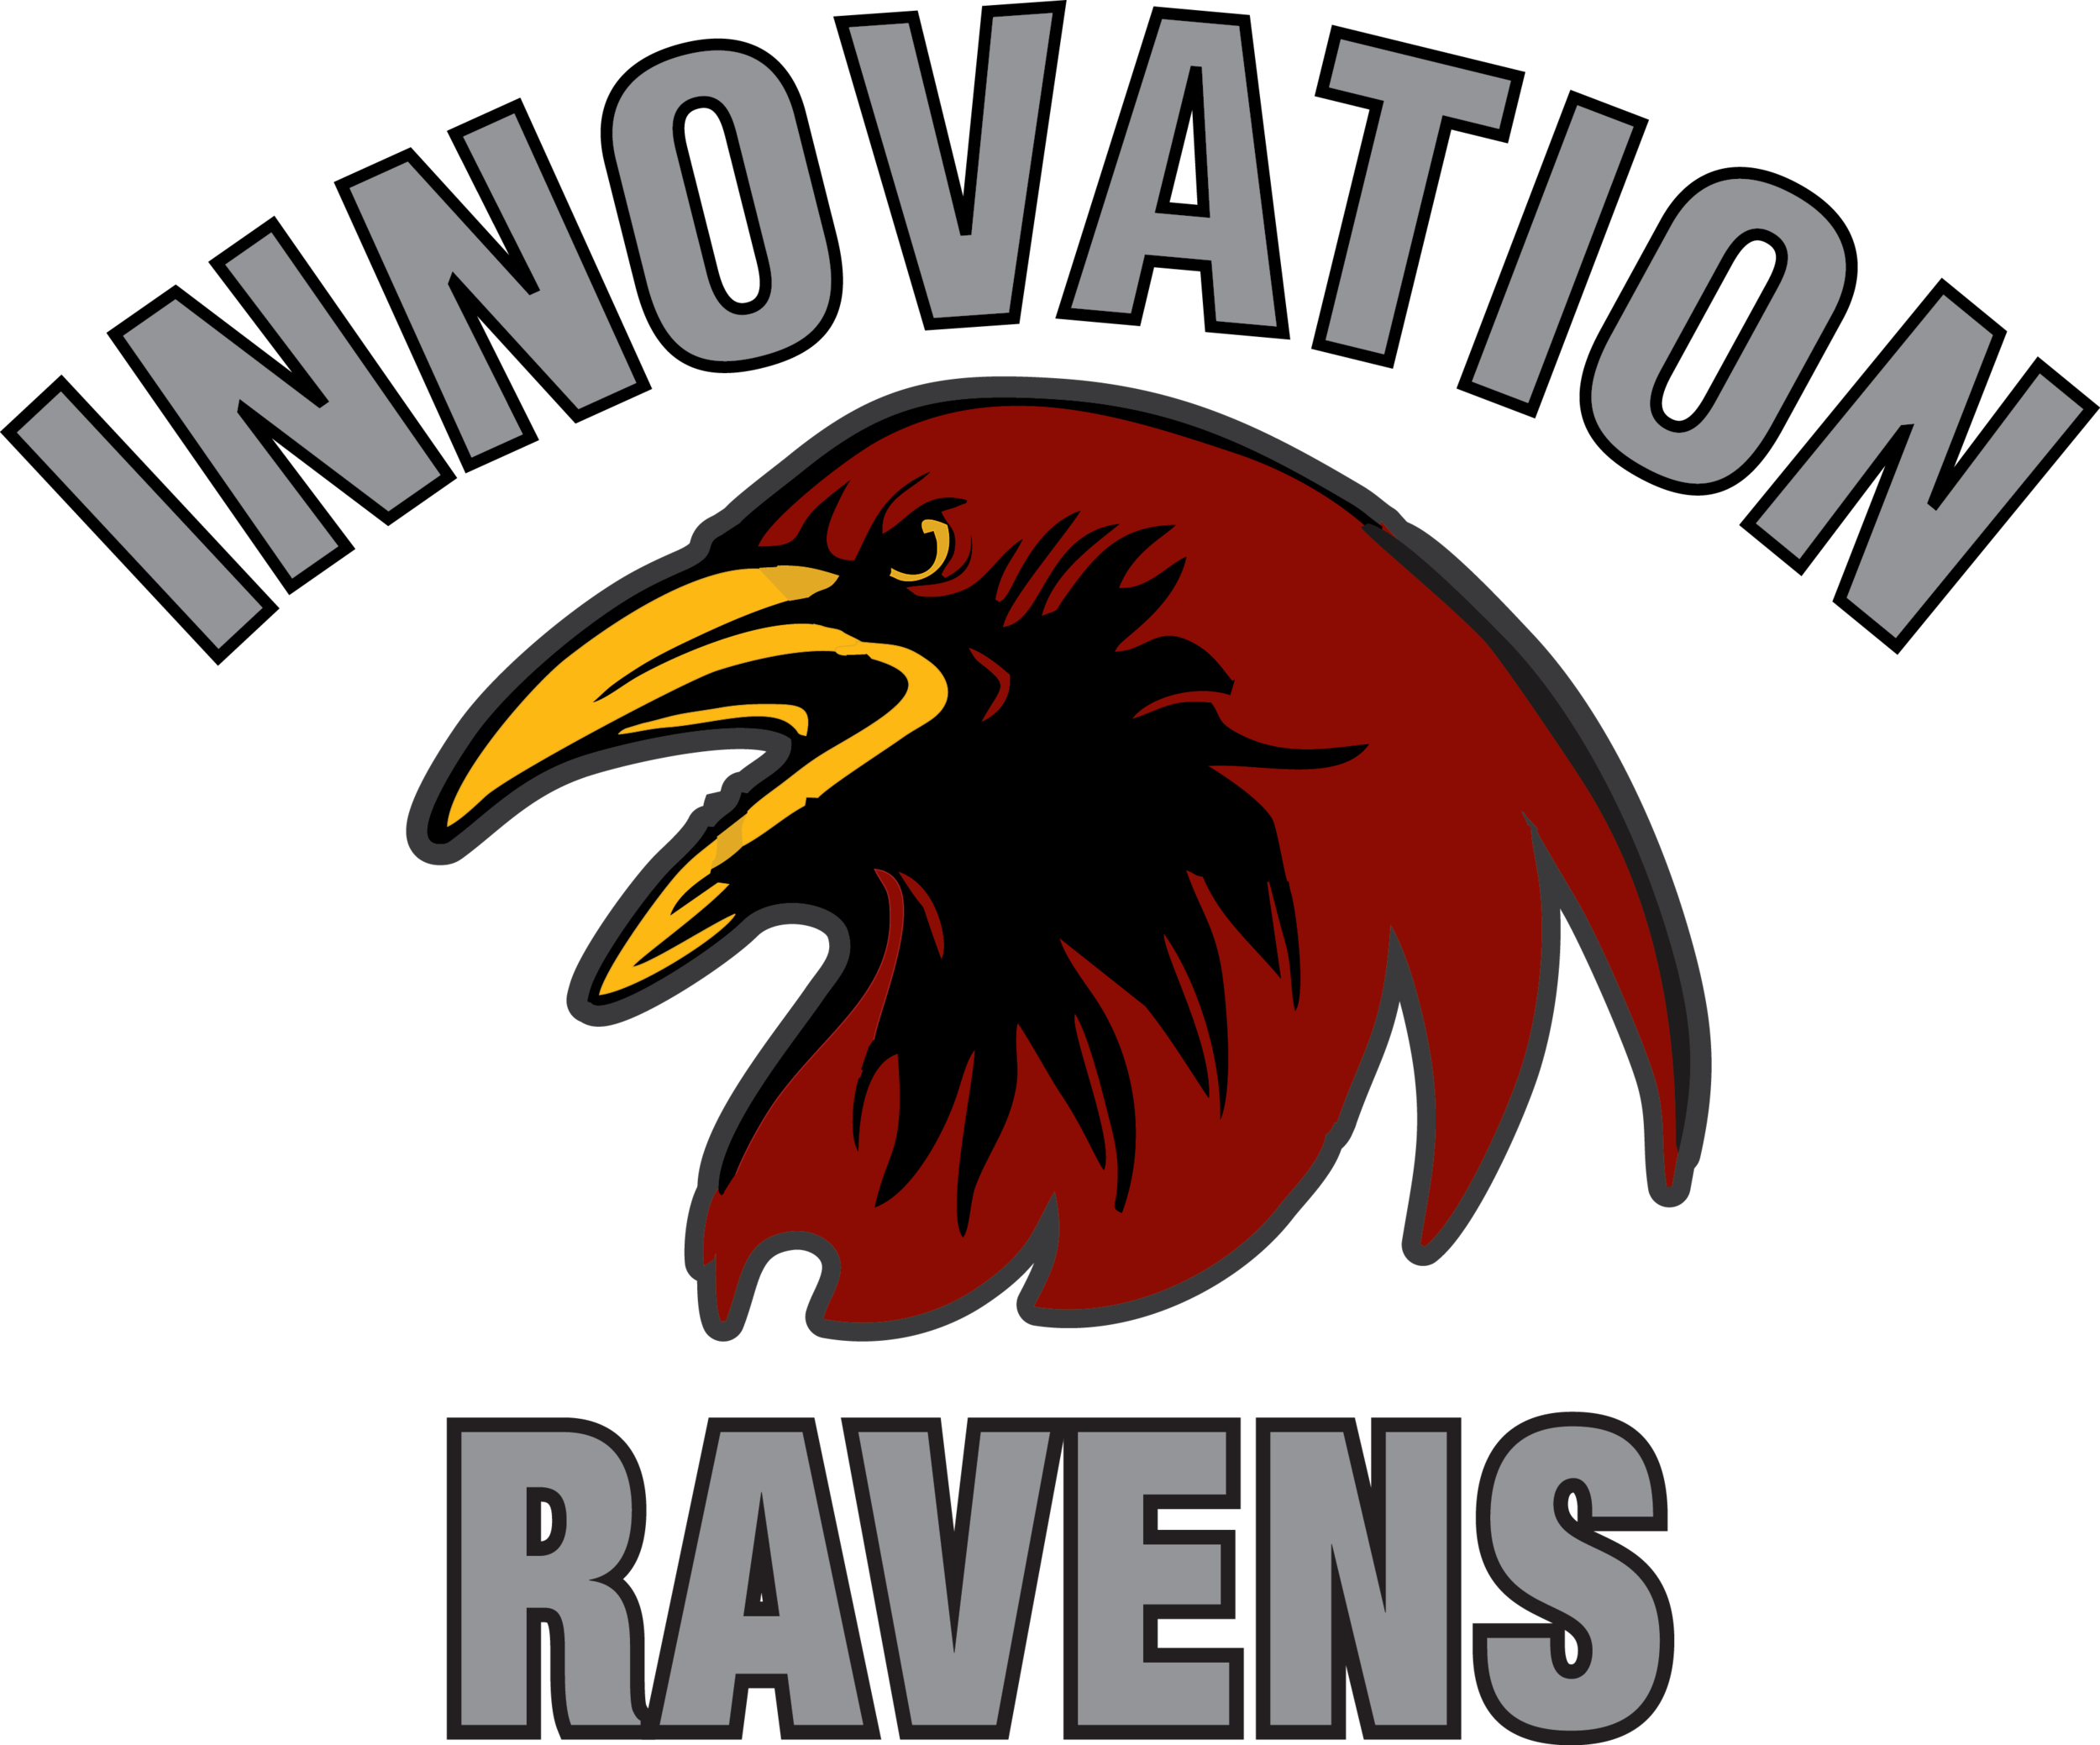 The Innovation Ravens logo